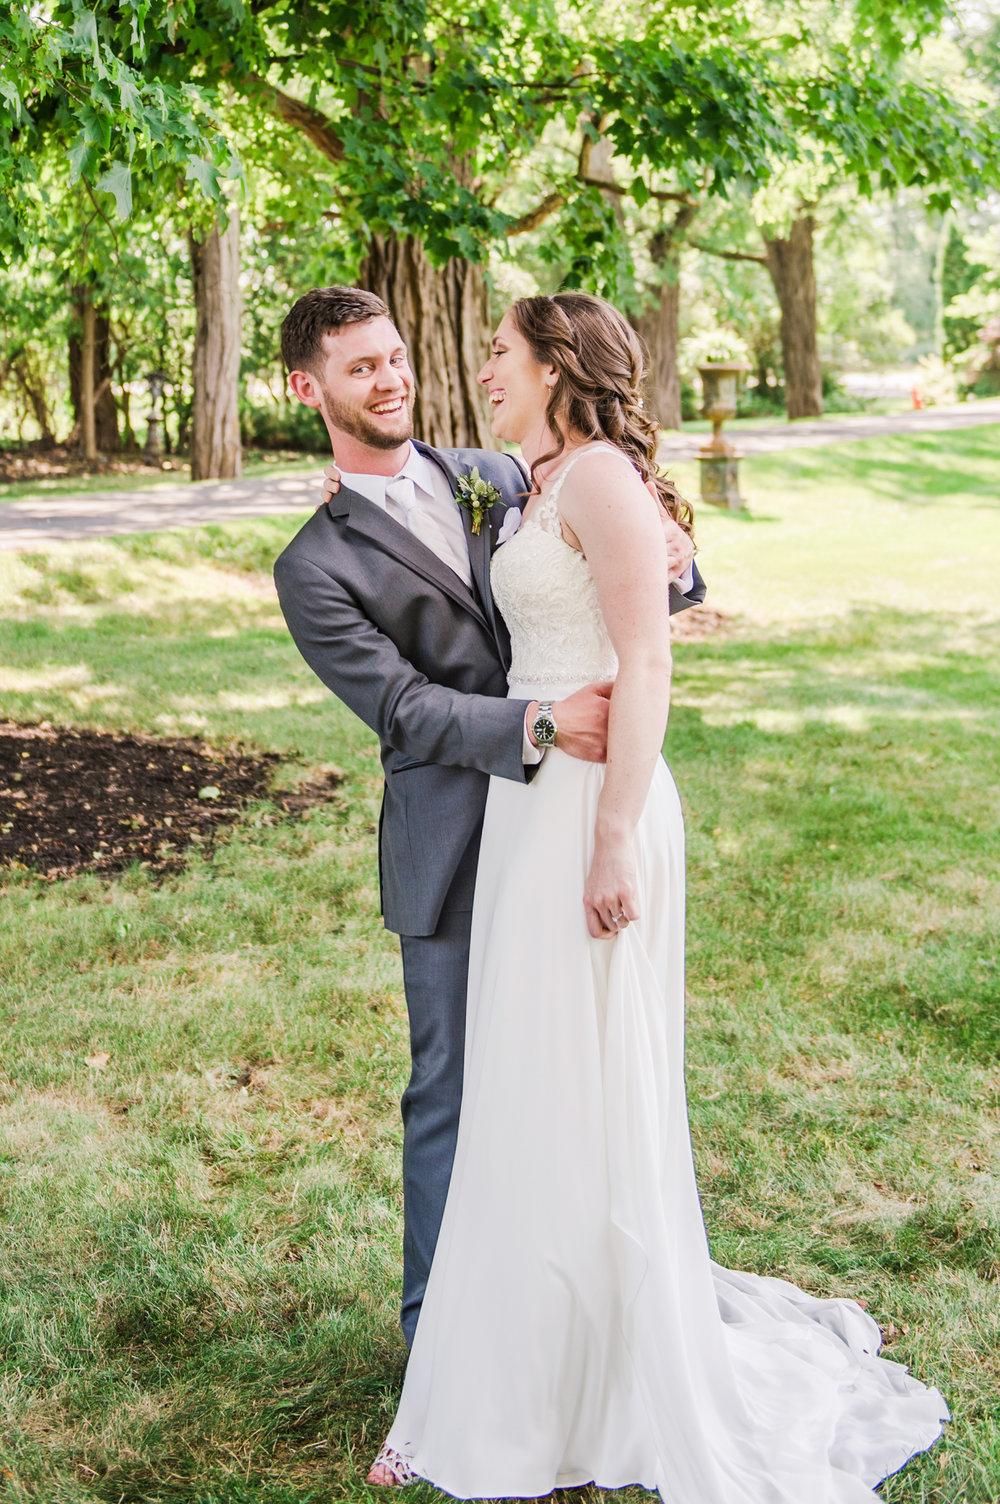 Jerris_Wadsworth_Wedding_Barn_Rochester_Wedding_JILL_STUDIO_Rochester_NY_Photographer_DSC_2447.jpg